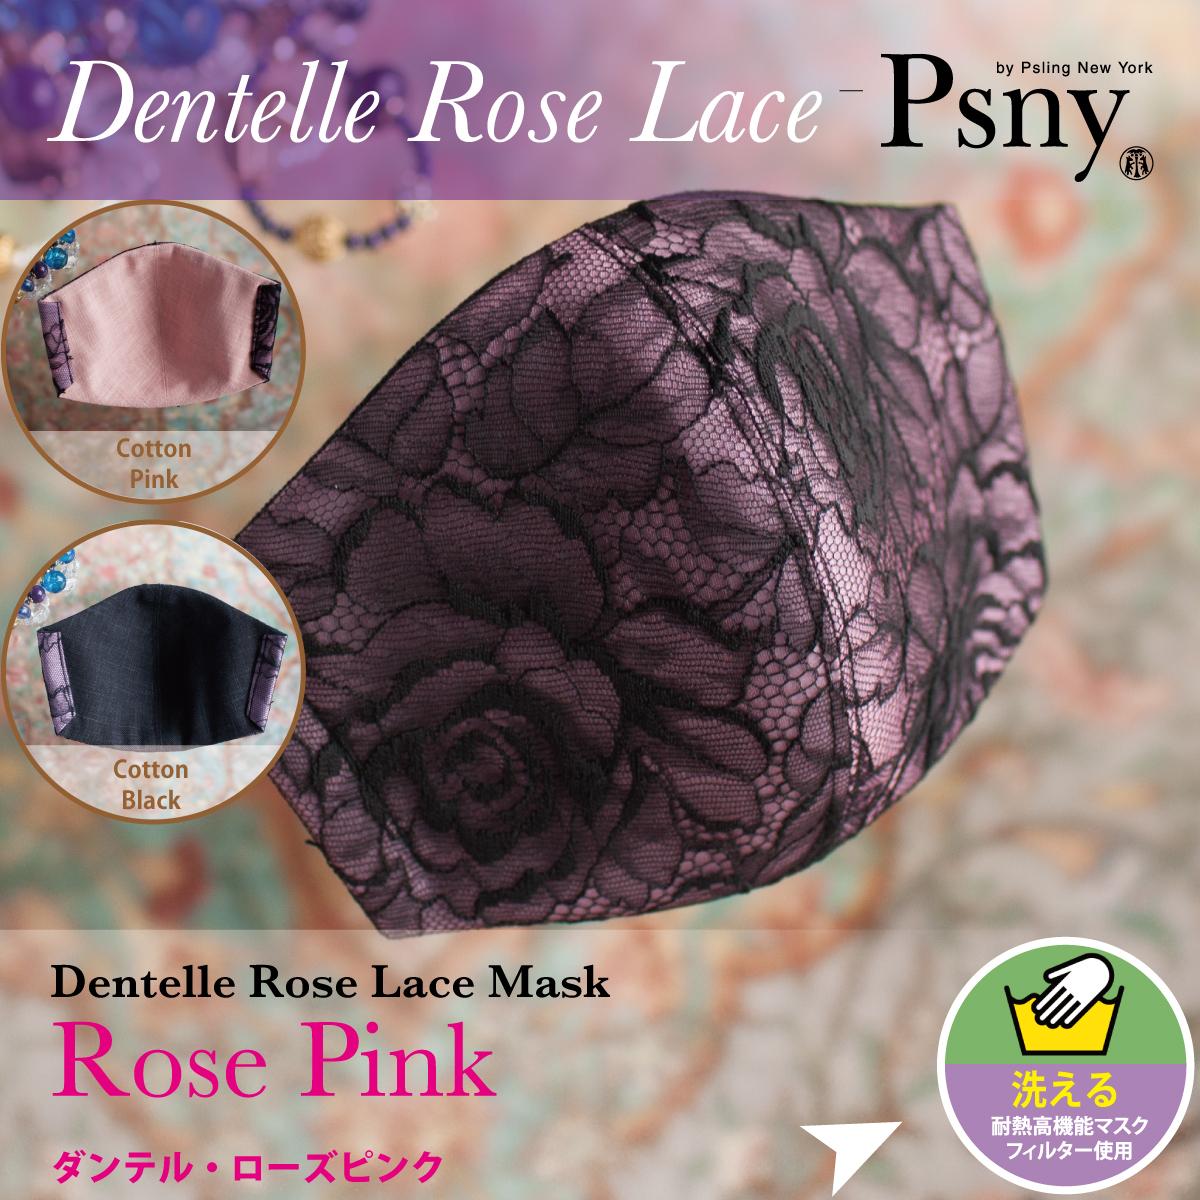 PSNY ダンテルローズピンク レースマスク 花粉 おしゃれ 立体 マスク 大人 薔薇 バラ 高級 美人 小顔 黒レース